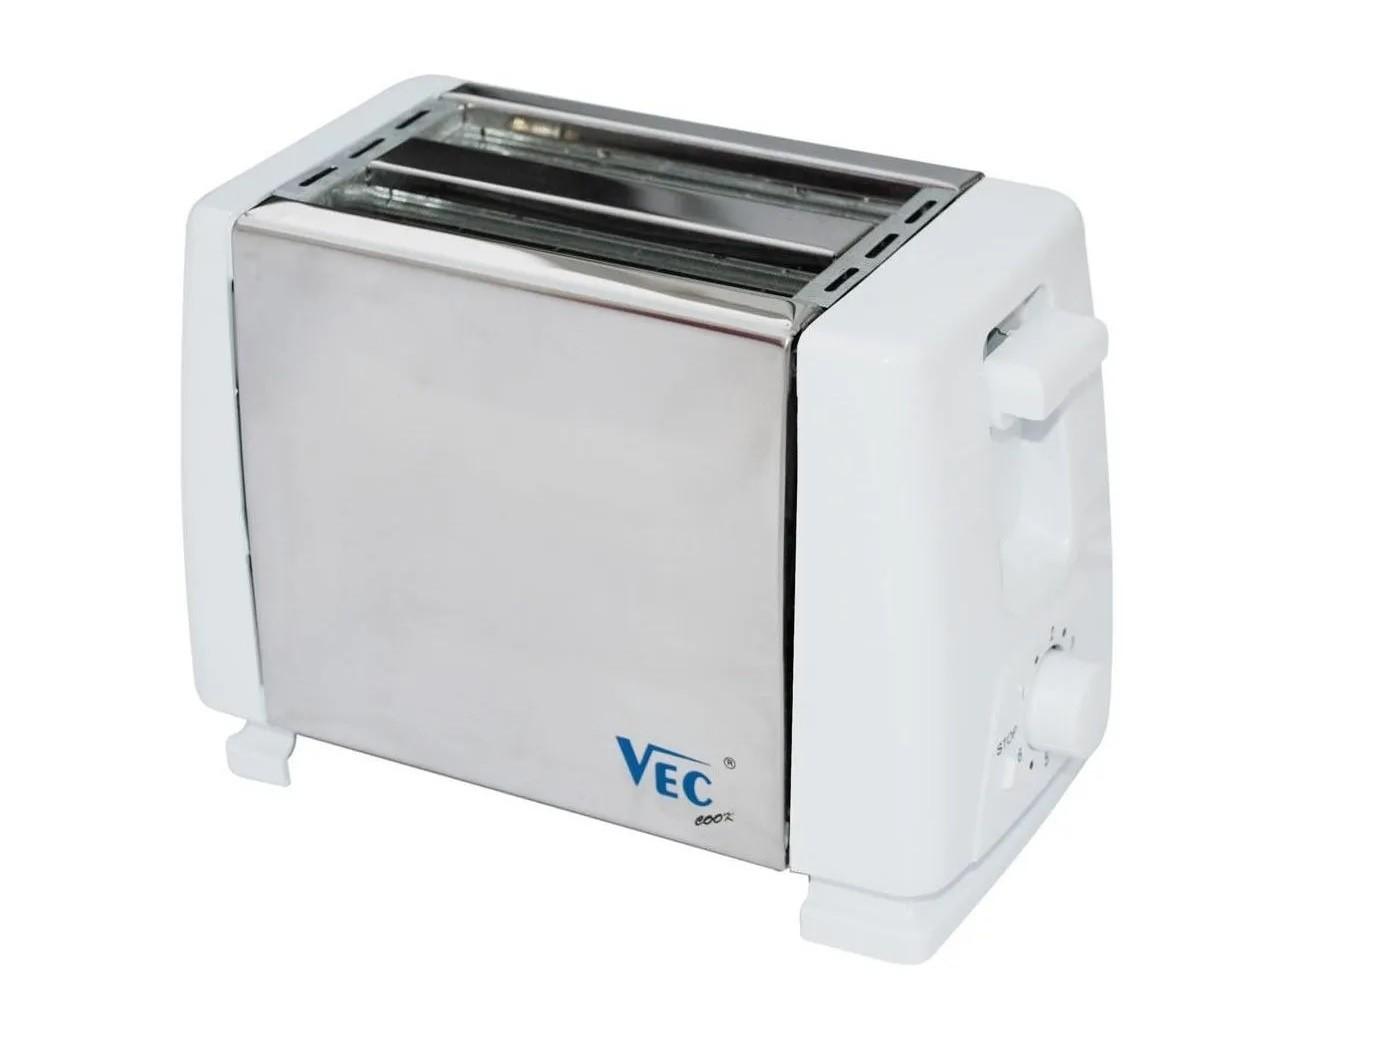 Torradeira Elétrica 750W Inox 6 níveis TP-802I 220V Vec  - Mix Eletro